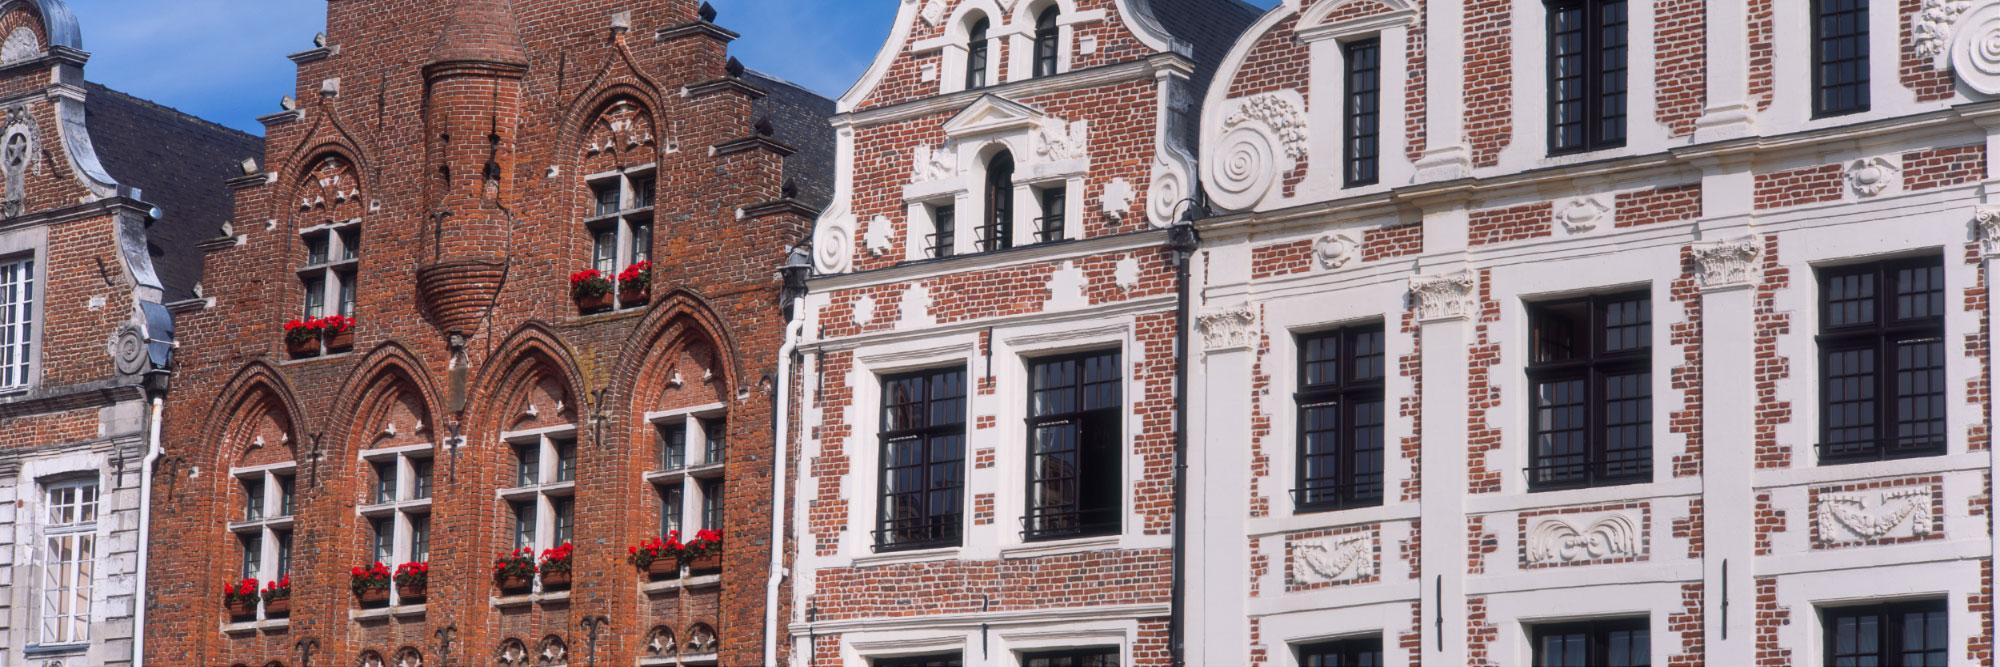 Façades de la Grand Place d'Arras